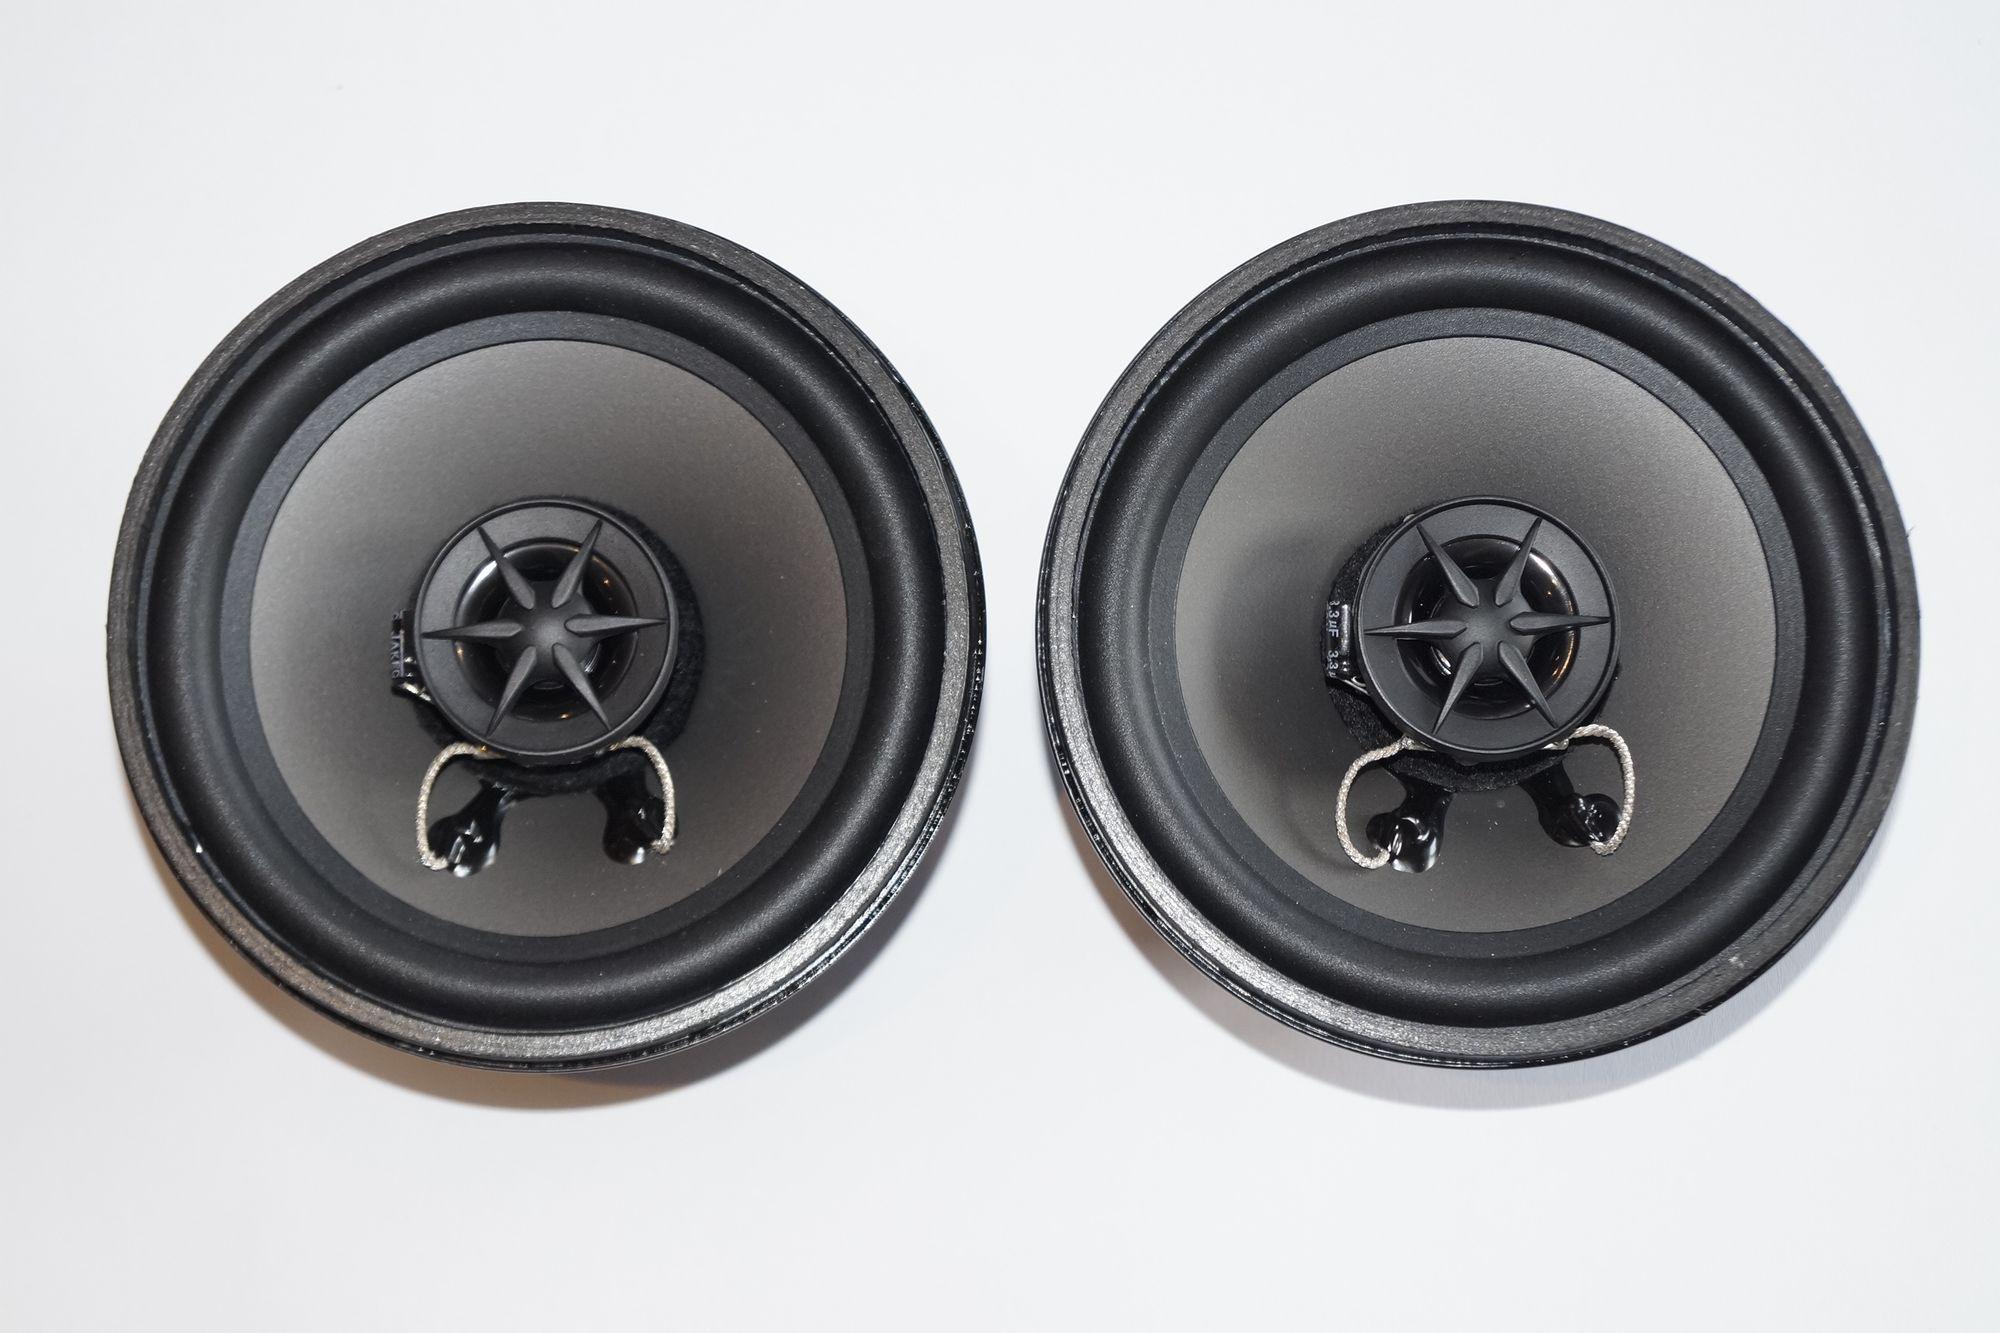 Mercedes Benz W 124 2 Wege Lautsprecher Front Armaturenbrett PG Audio 1 Paar  001